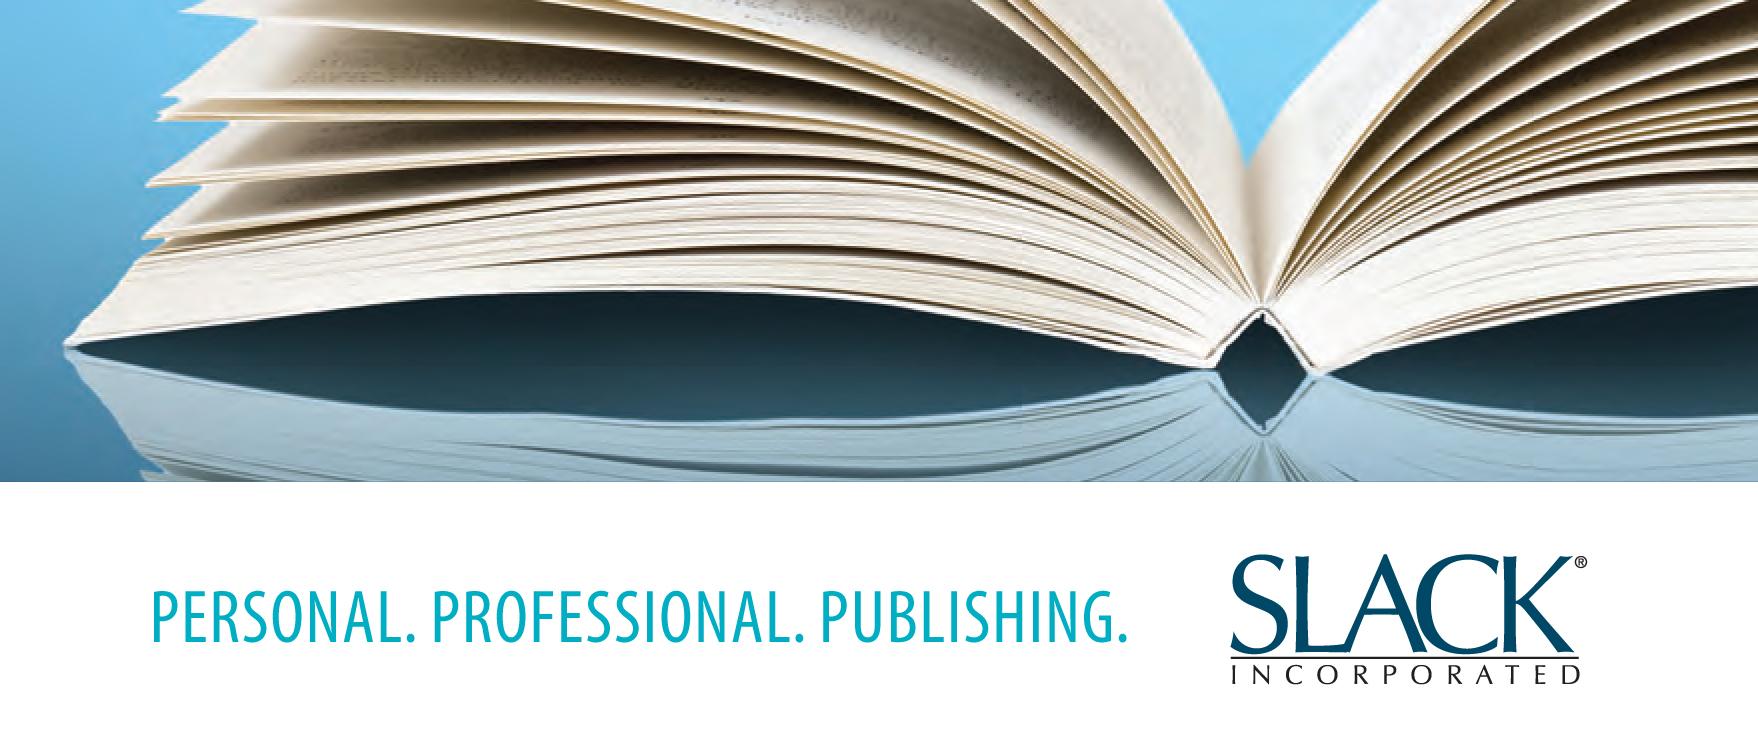 slack-personal-professional-publishing.jpg